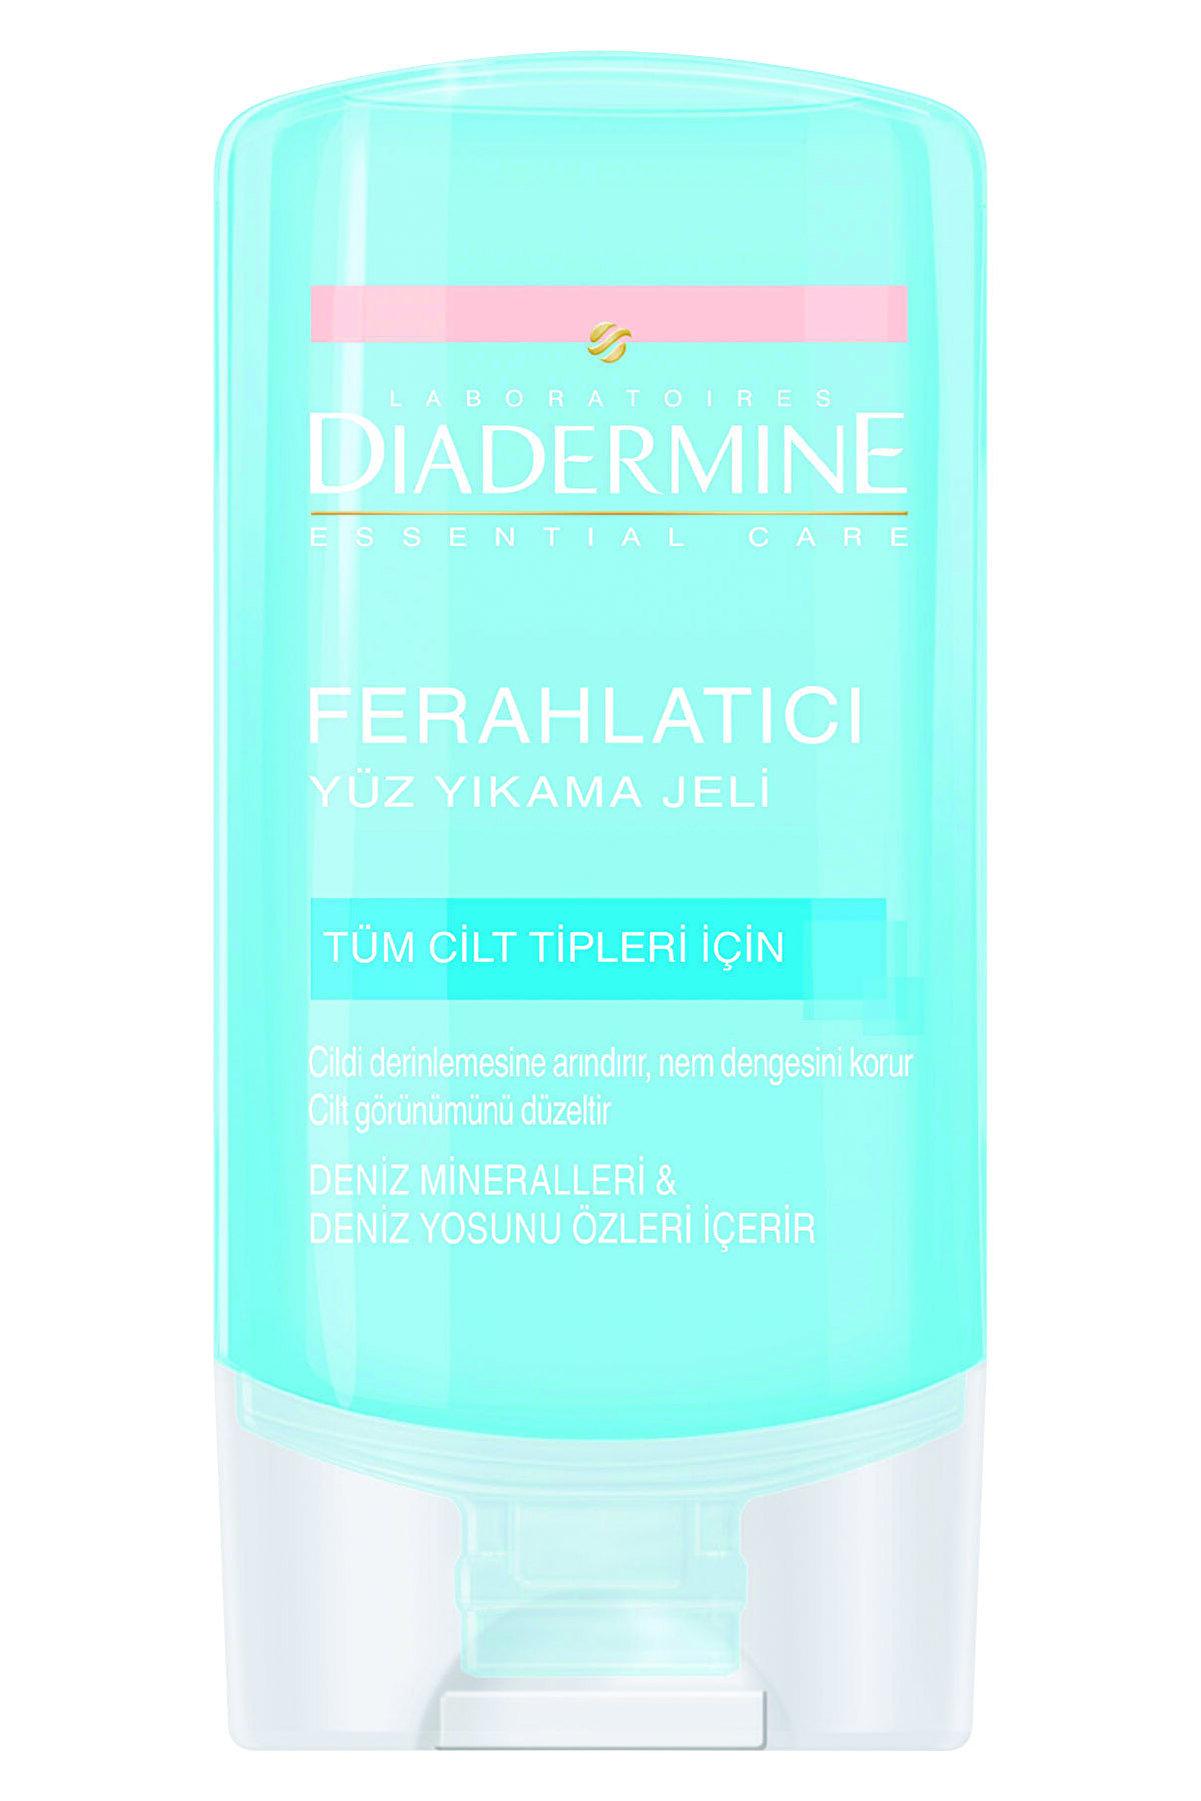 Diadermine Essentials Ferahlatıcı Yikama Jeli 150 ml